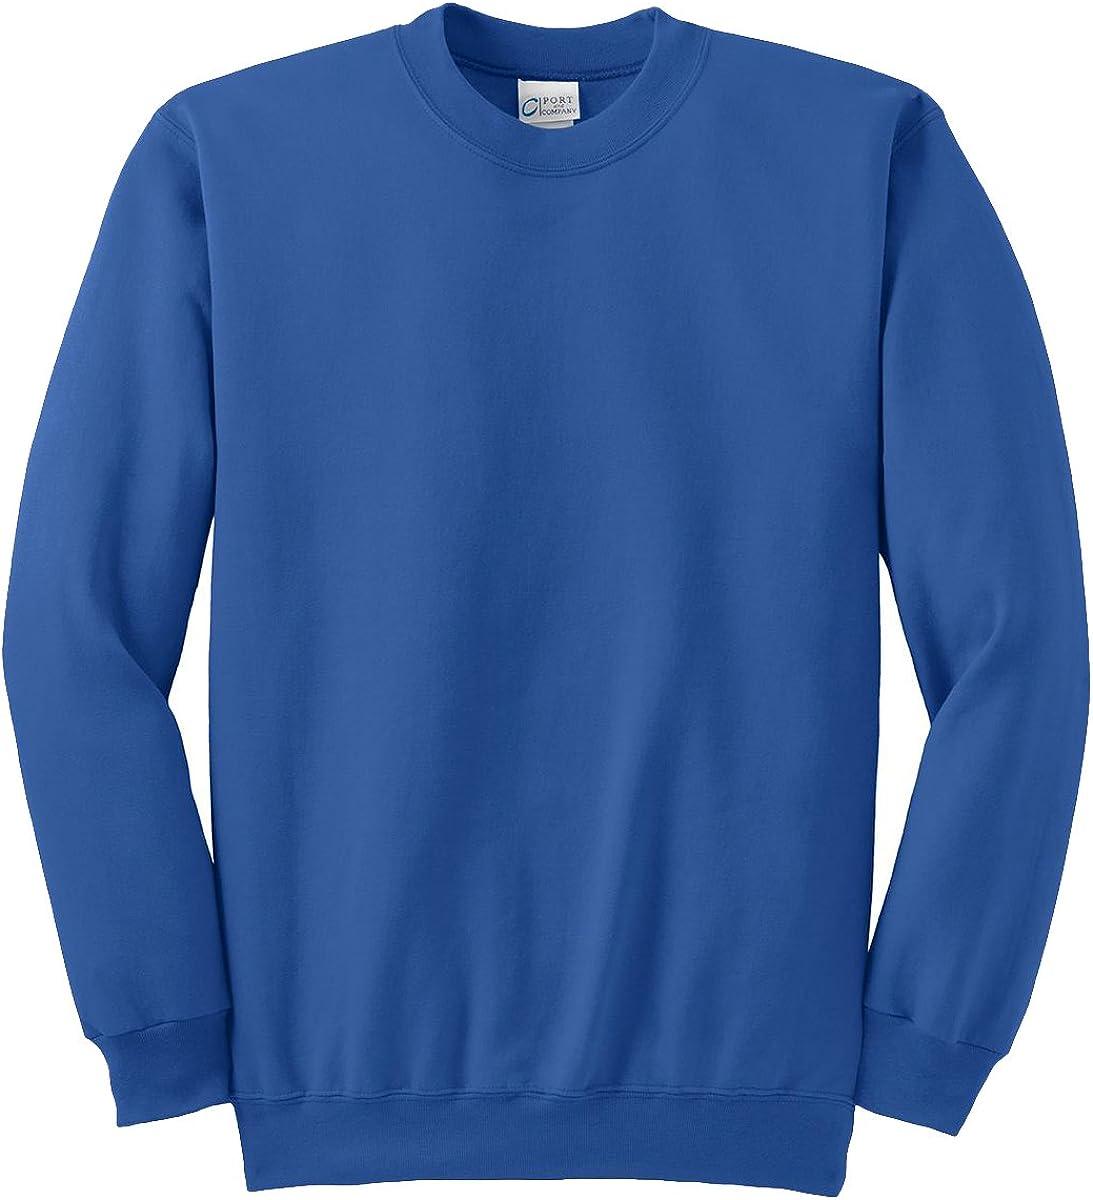 Port & Company Tall Ultimate Crewneck Sweatshirt>4XLT Royal PC90T